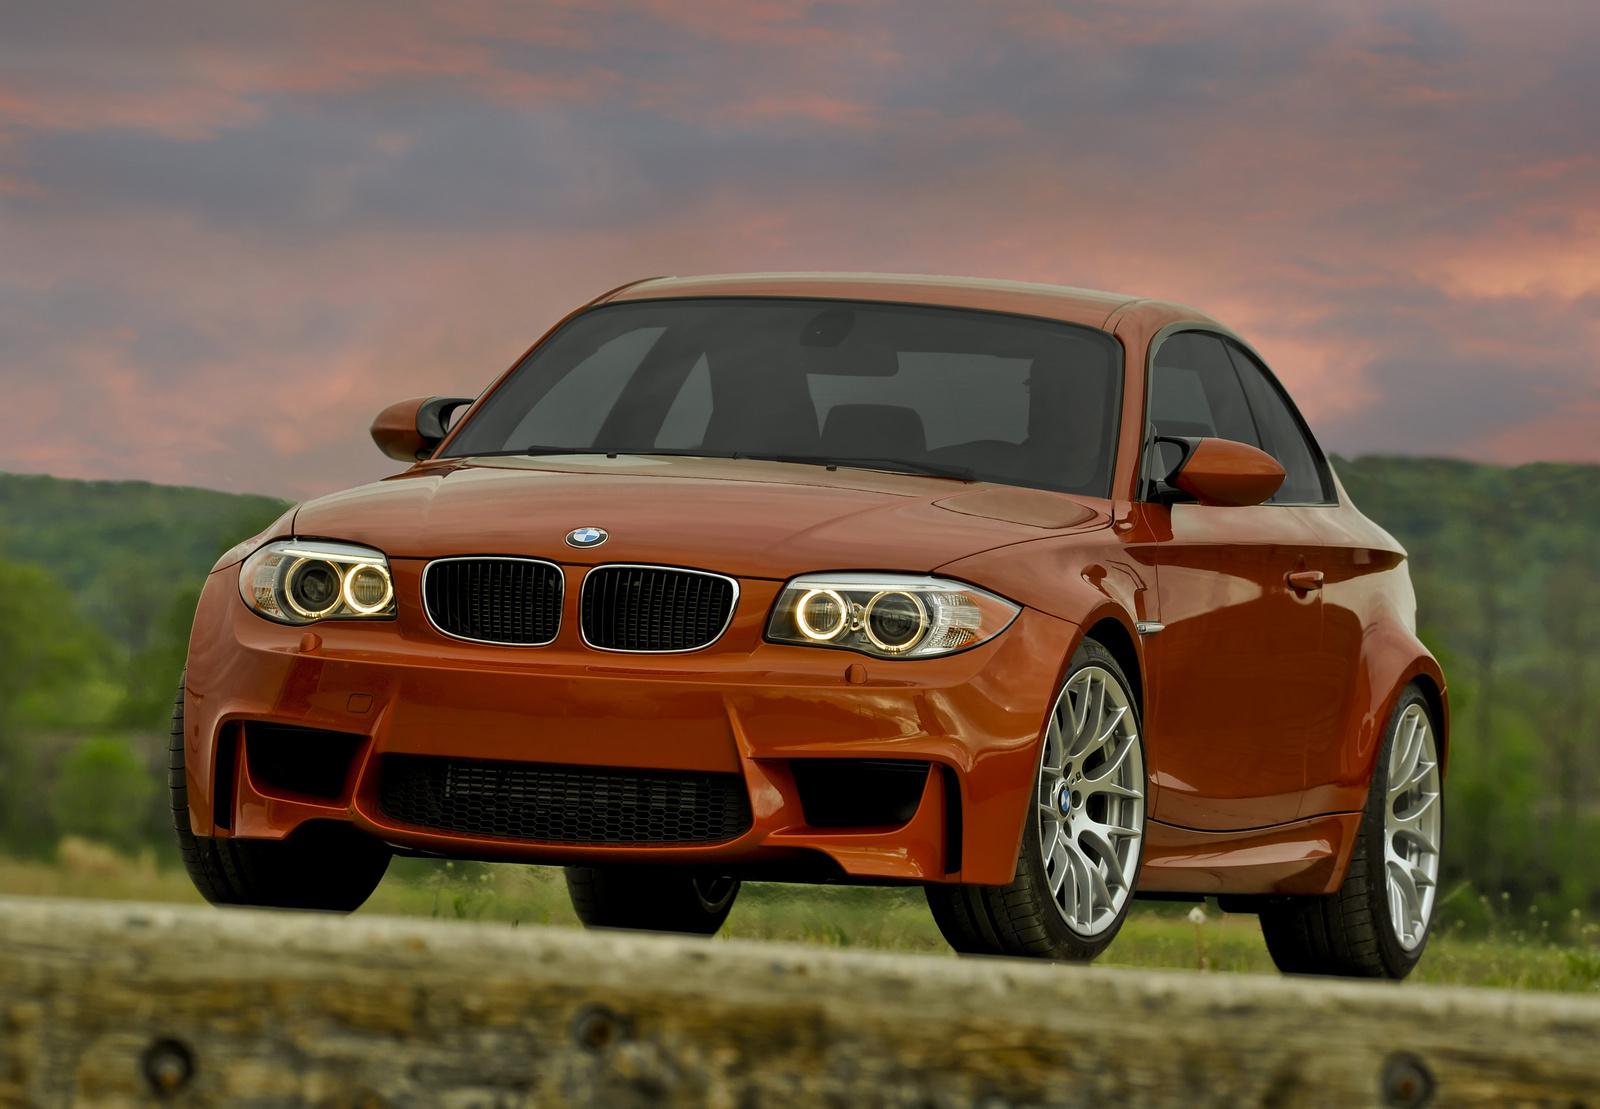 Delorean Car For Sale >> 2011 BMW 1M - Overview - CarGurus